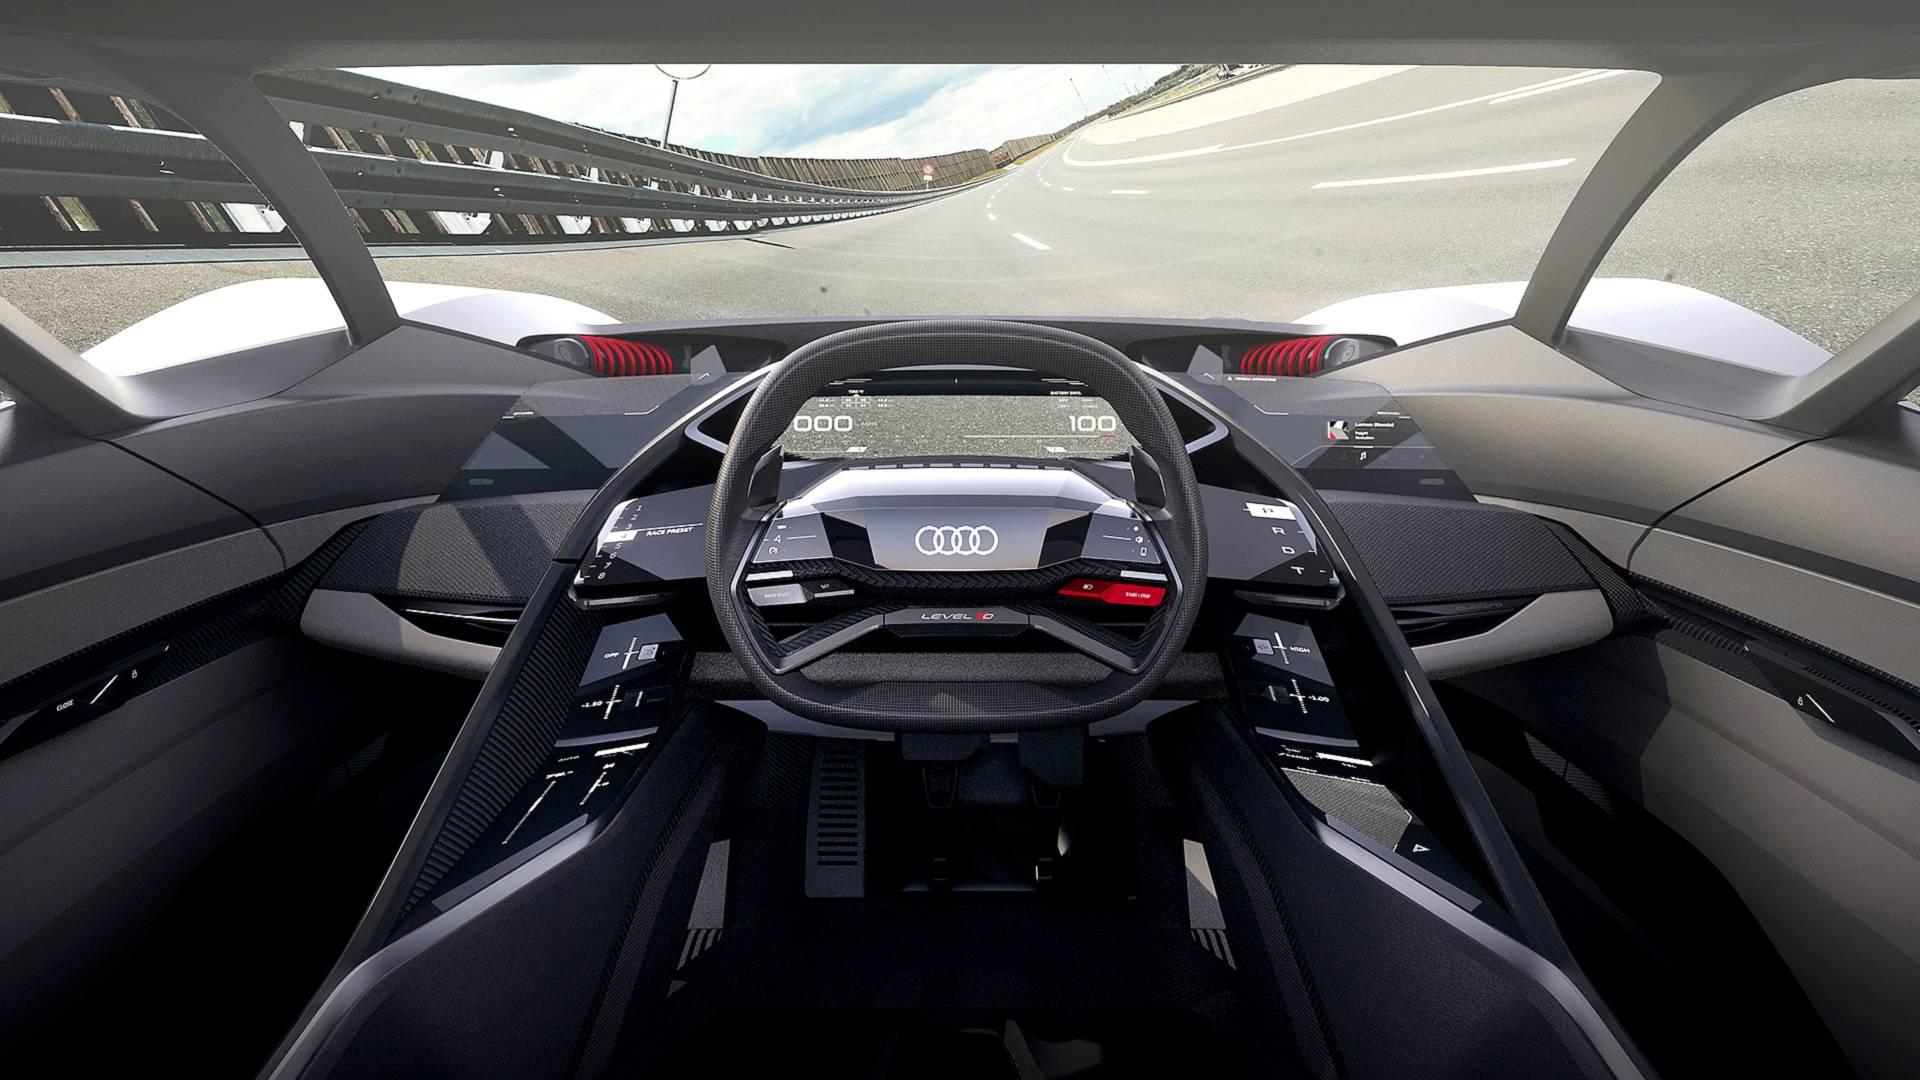 Audi PB18 E-tron concept single seater